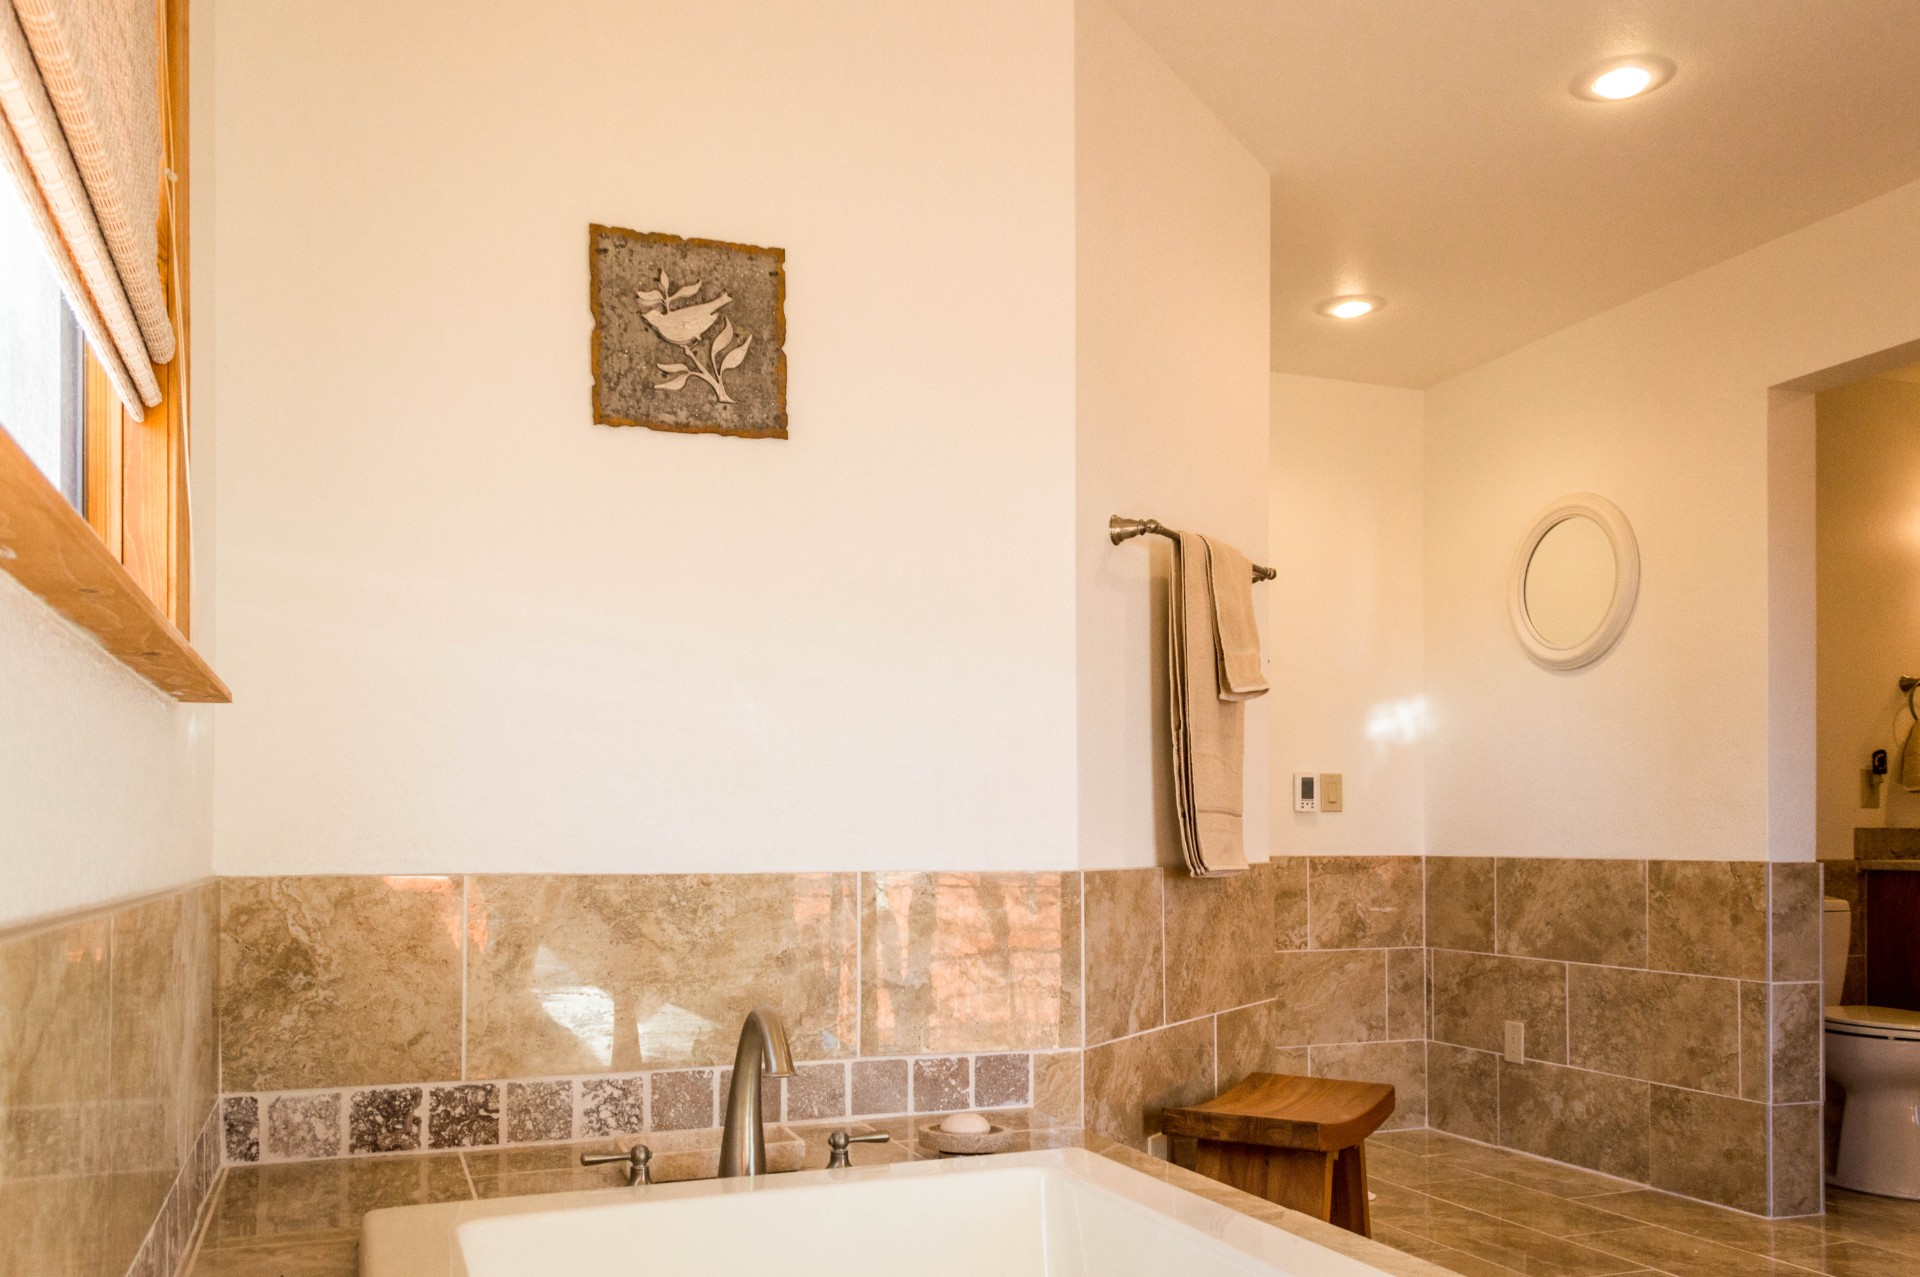 Completed bathroom with a custom bathtub.